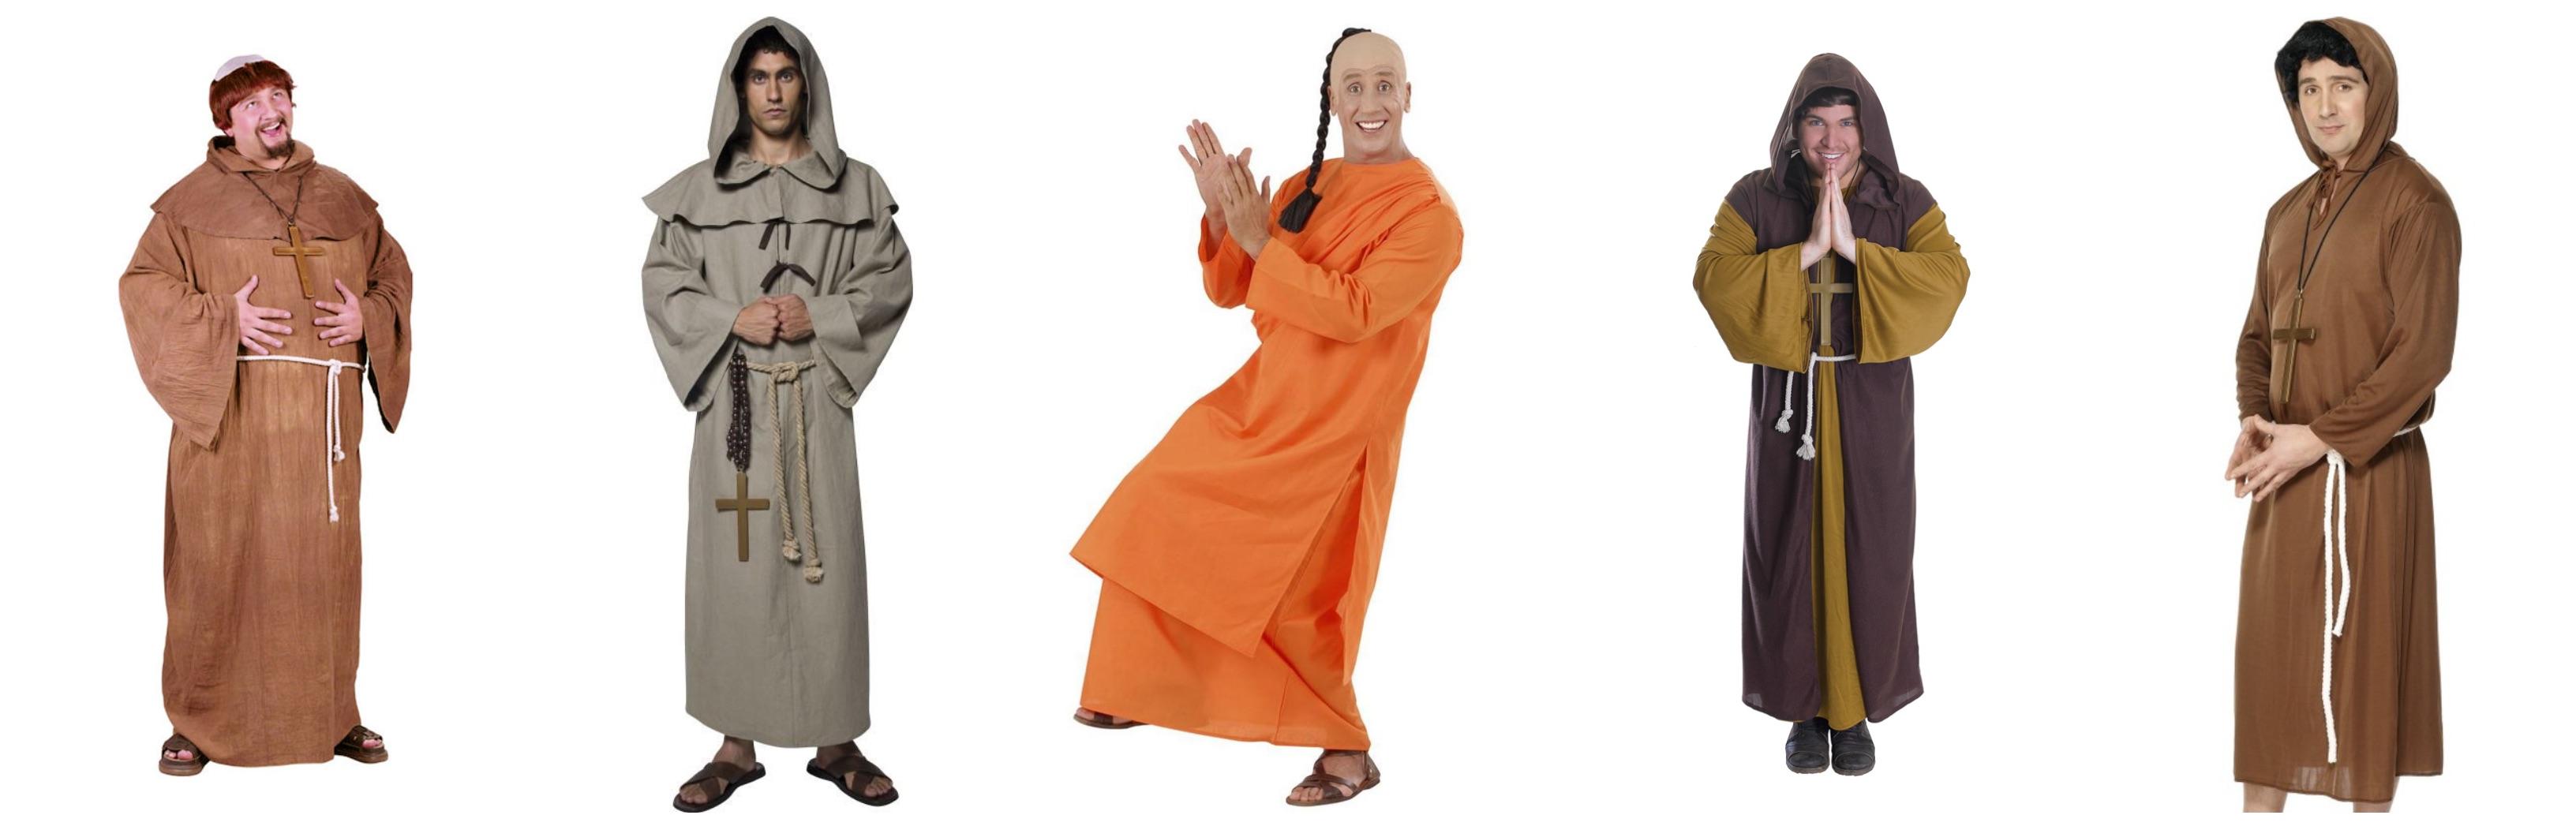 munke kostume til voksne 1 - Munke kostume til voksne